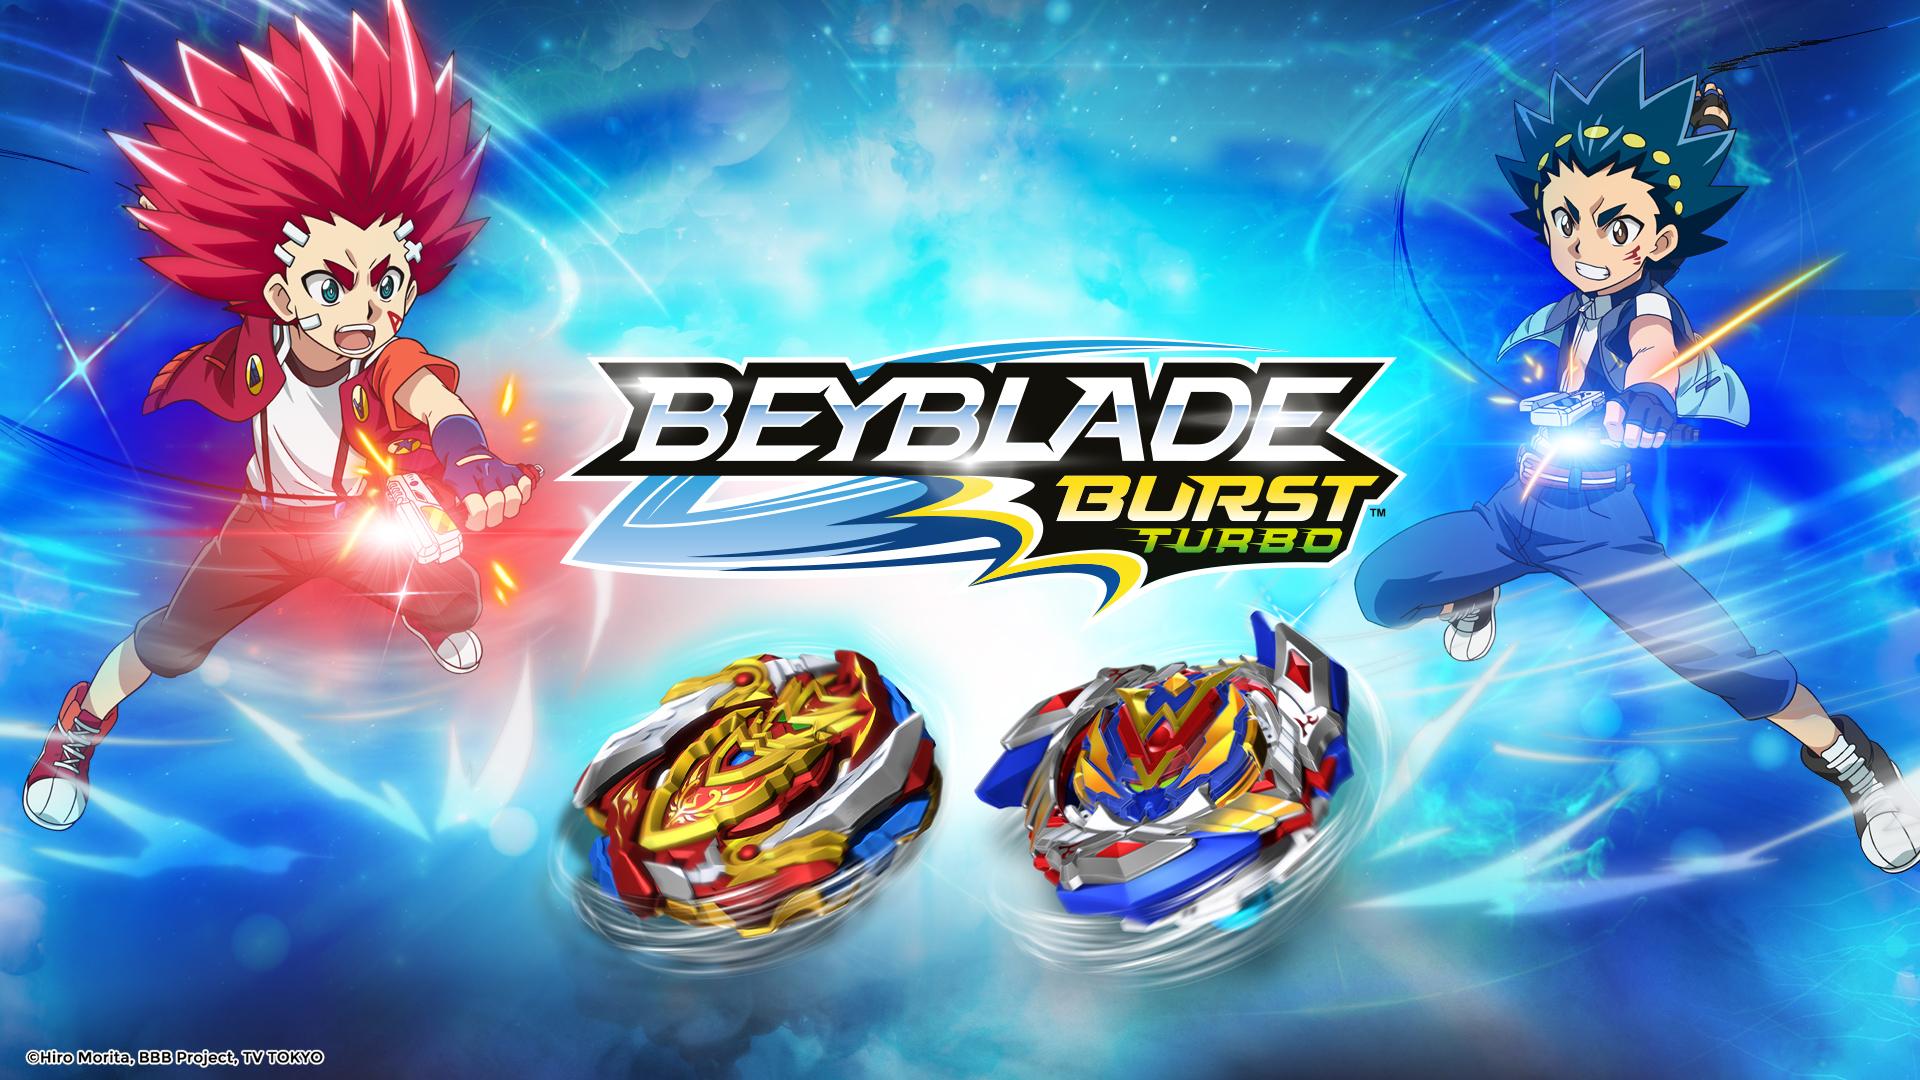 Beyblade Burst Turbo 1